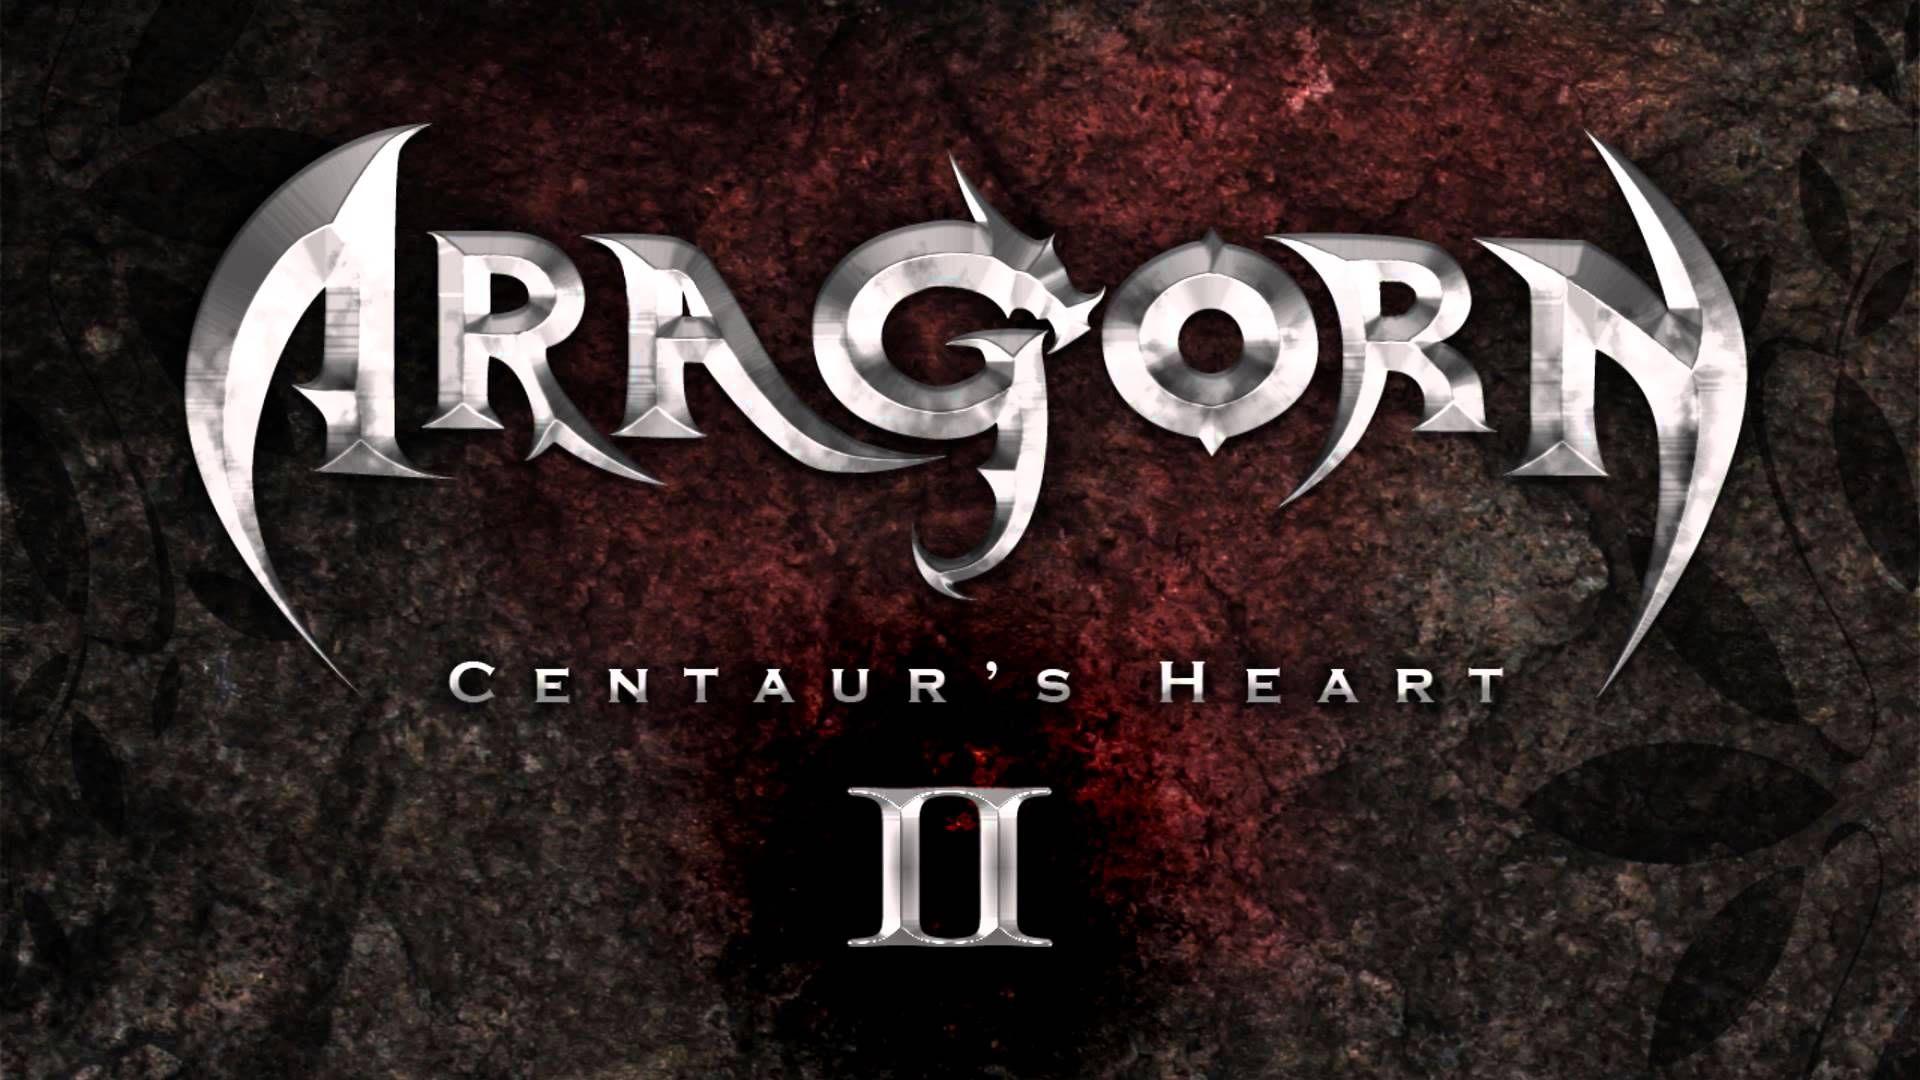 Aragorn - Centaur Heart II (single 2014)